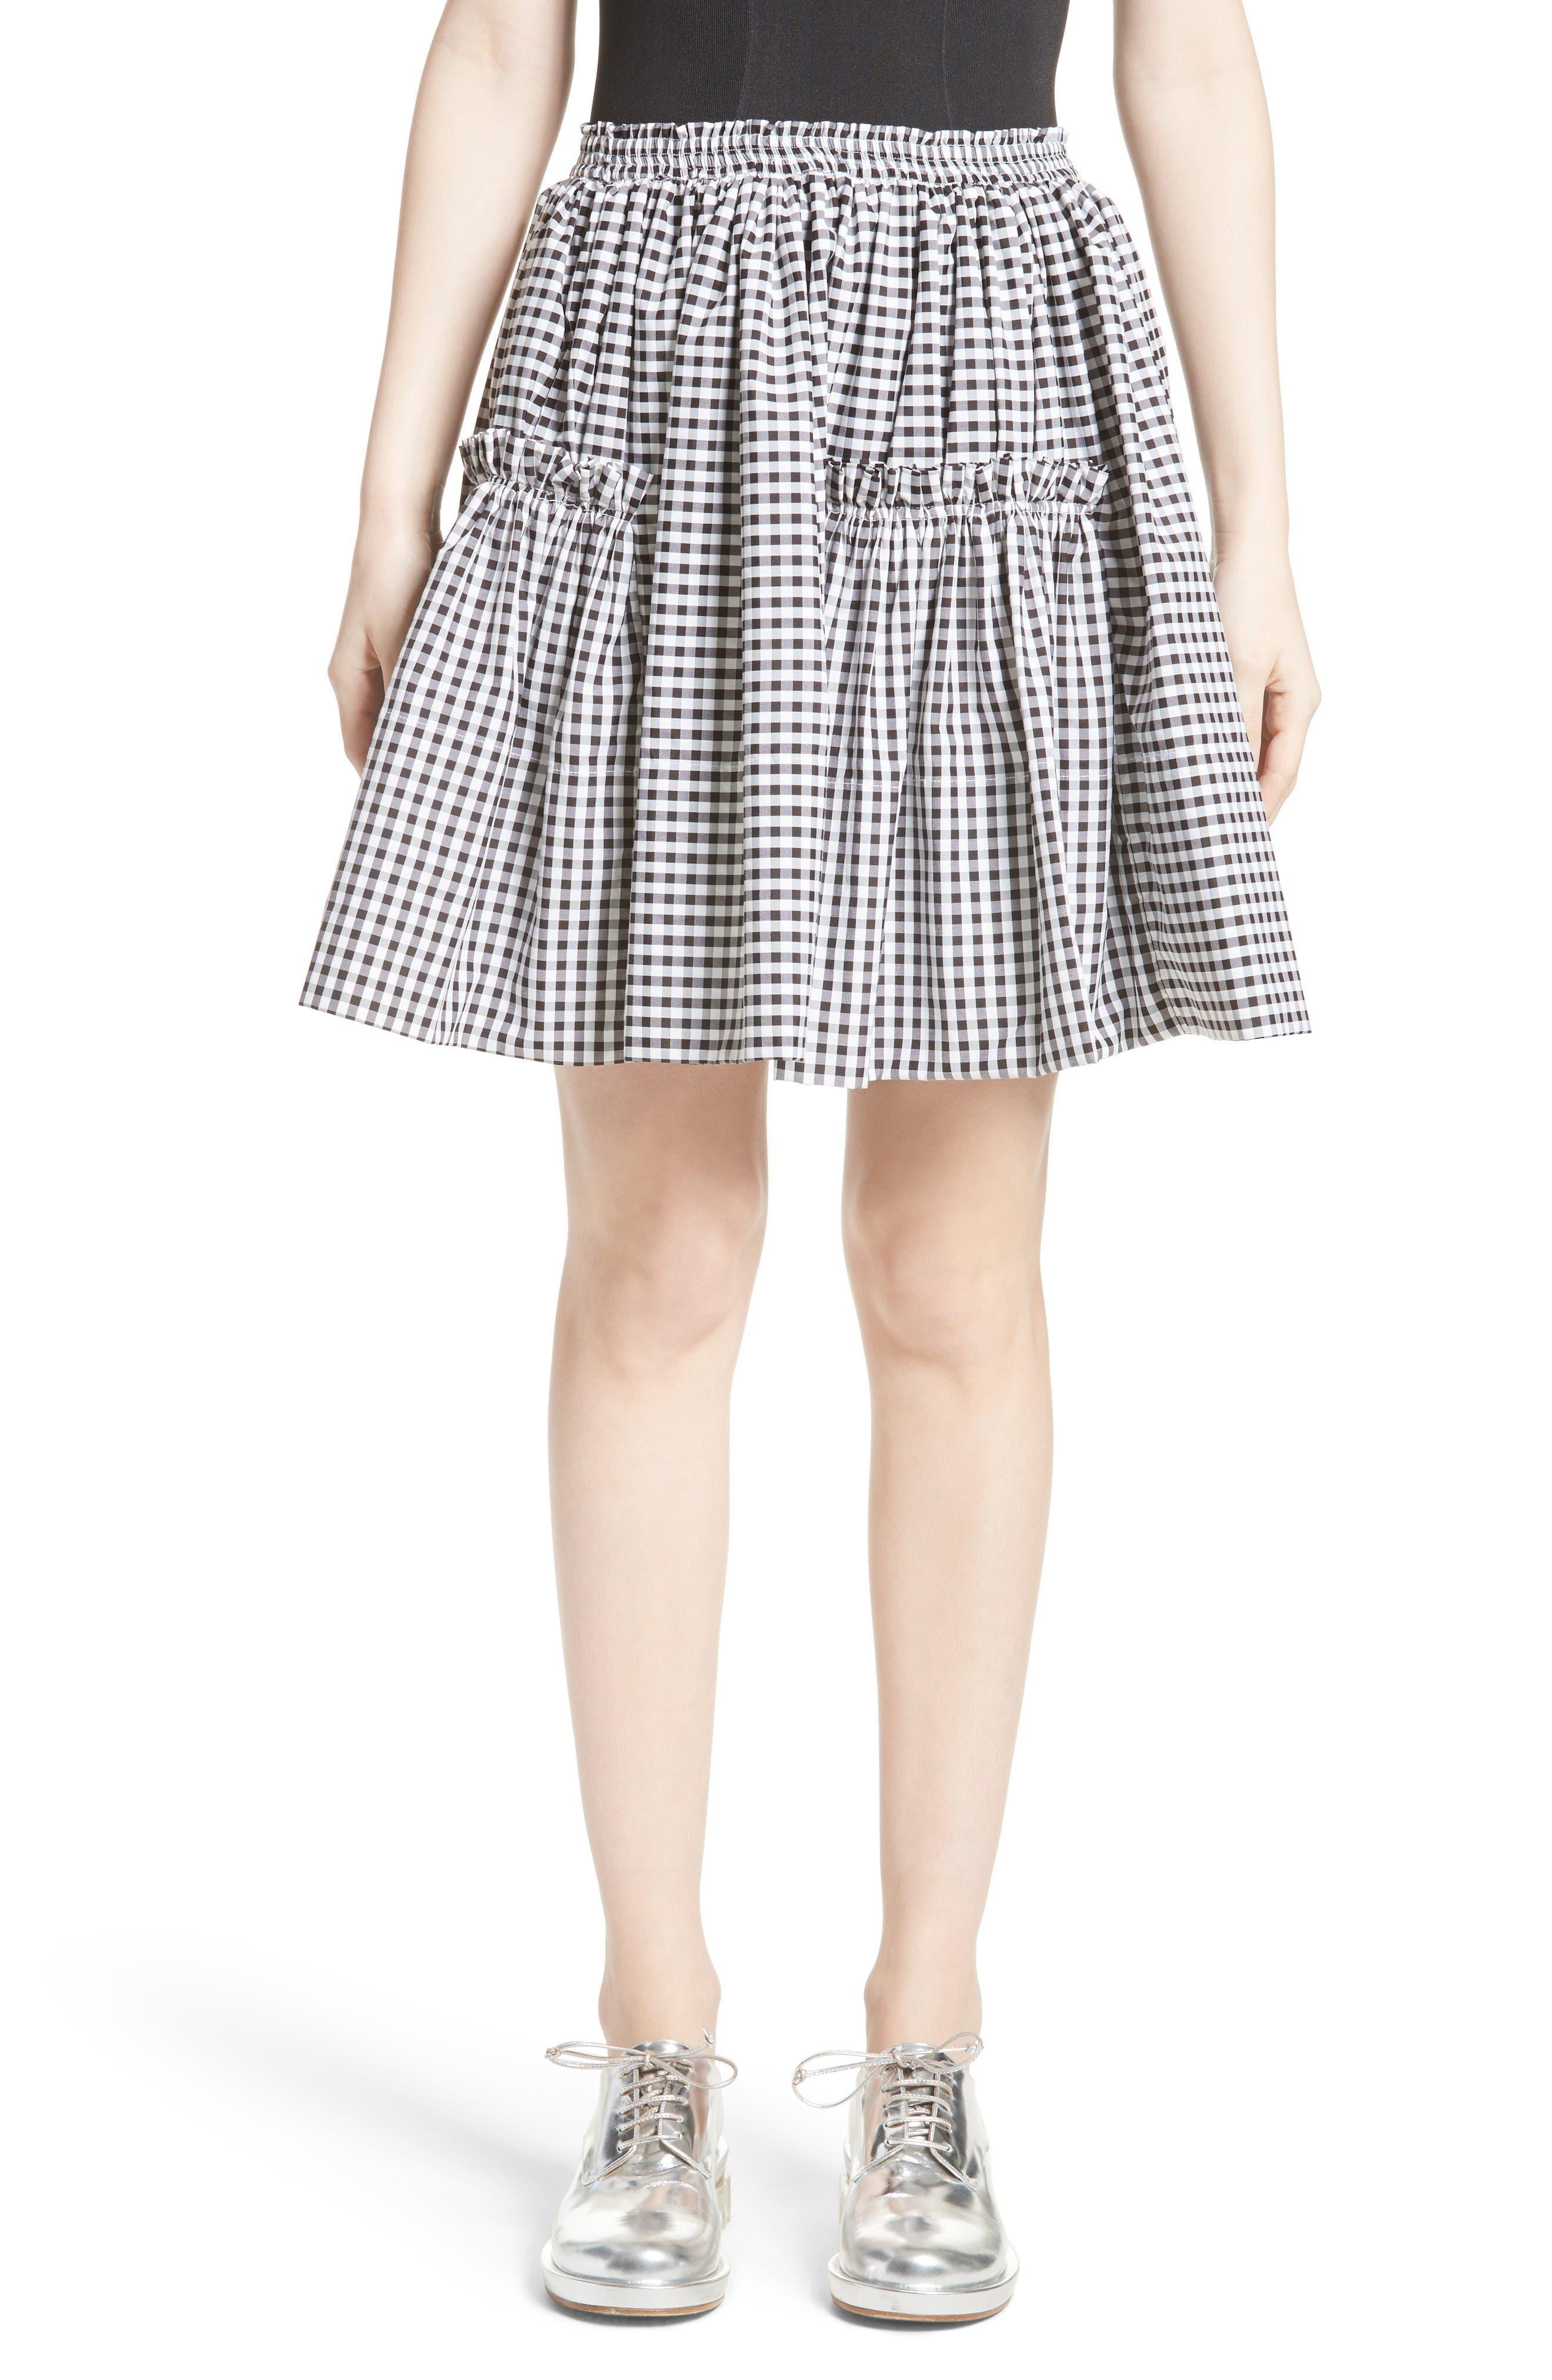 Molly Goddard Georgia Skirt